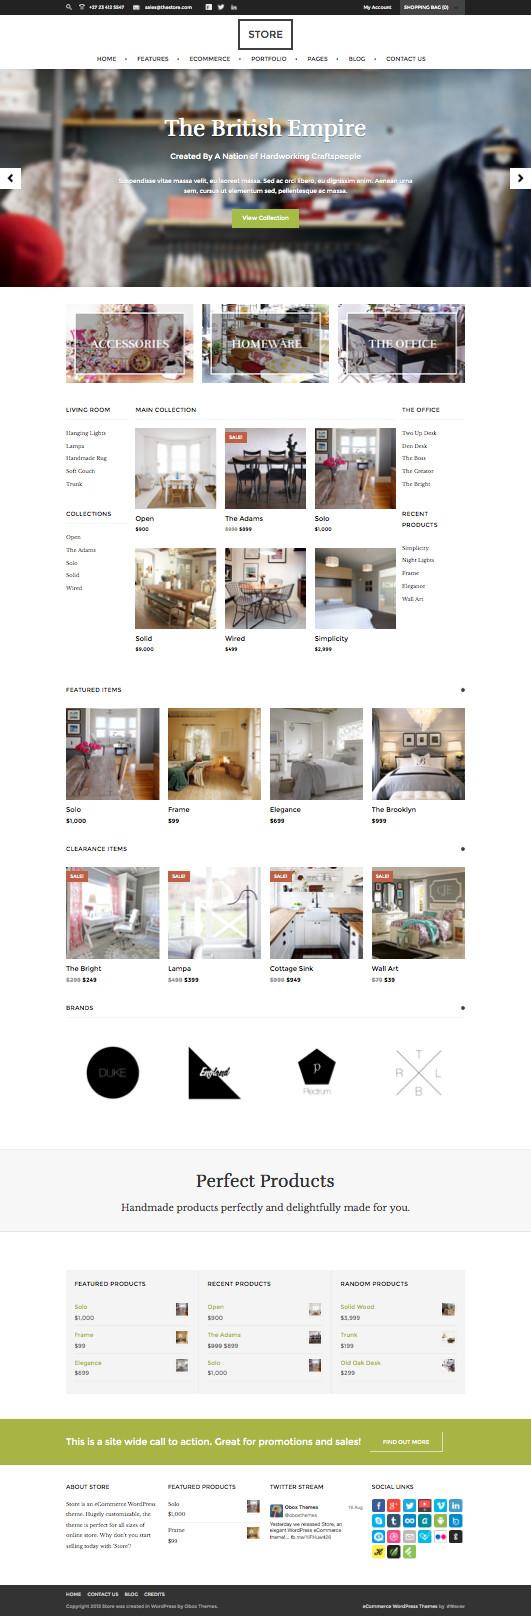 Store Online eCommerce WordPress Theme